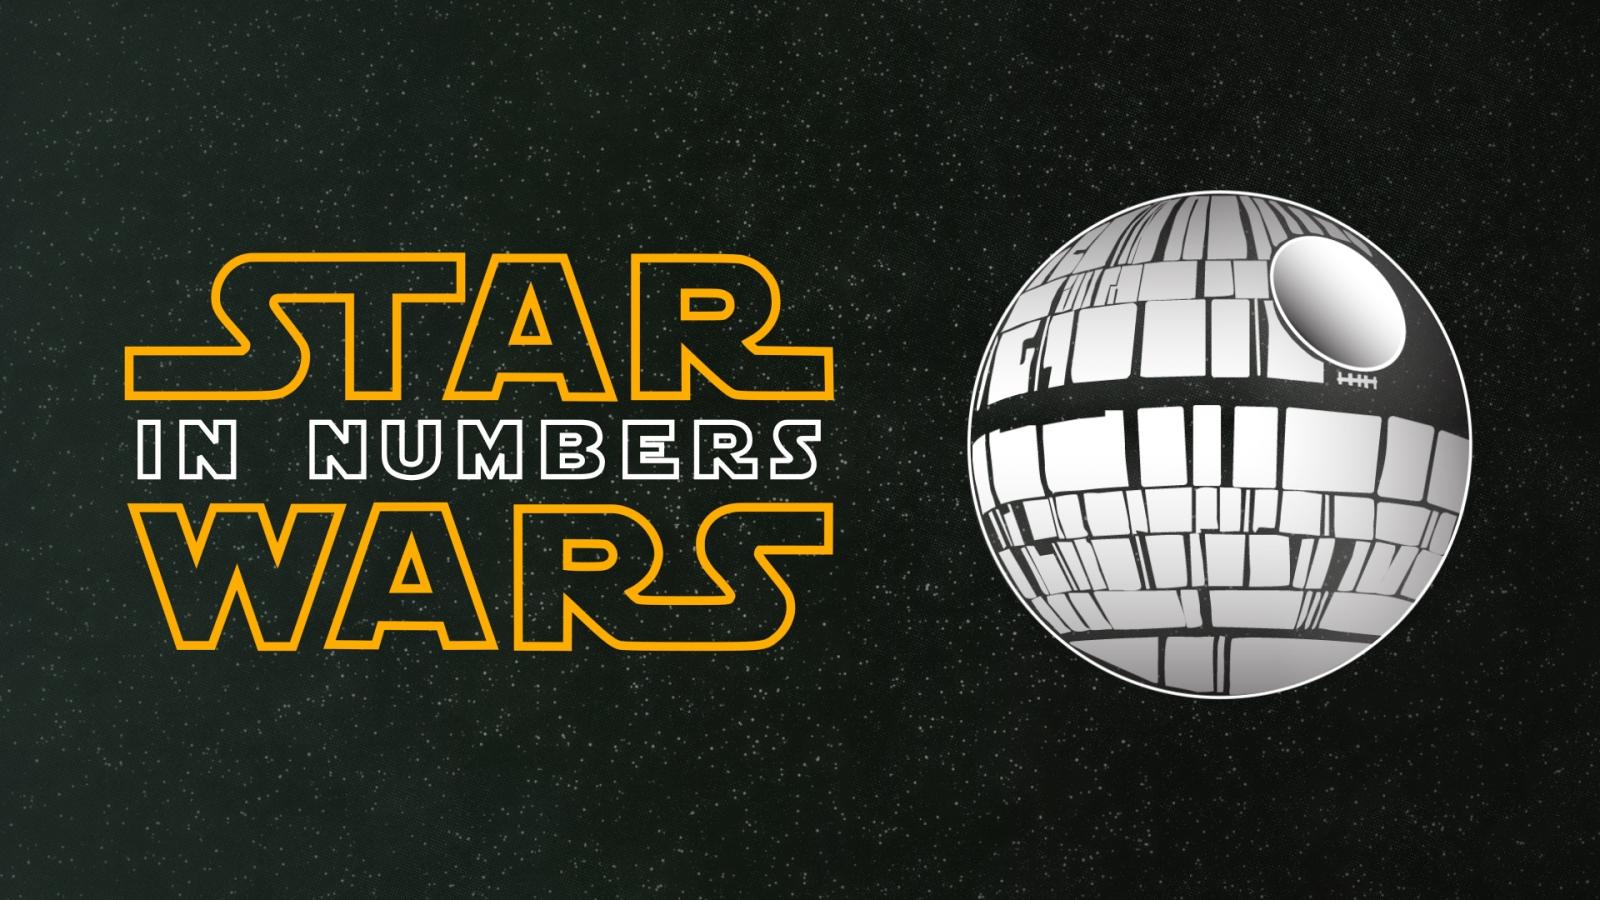 Star Wars in numbers